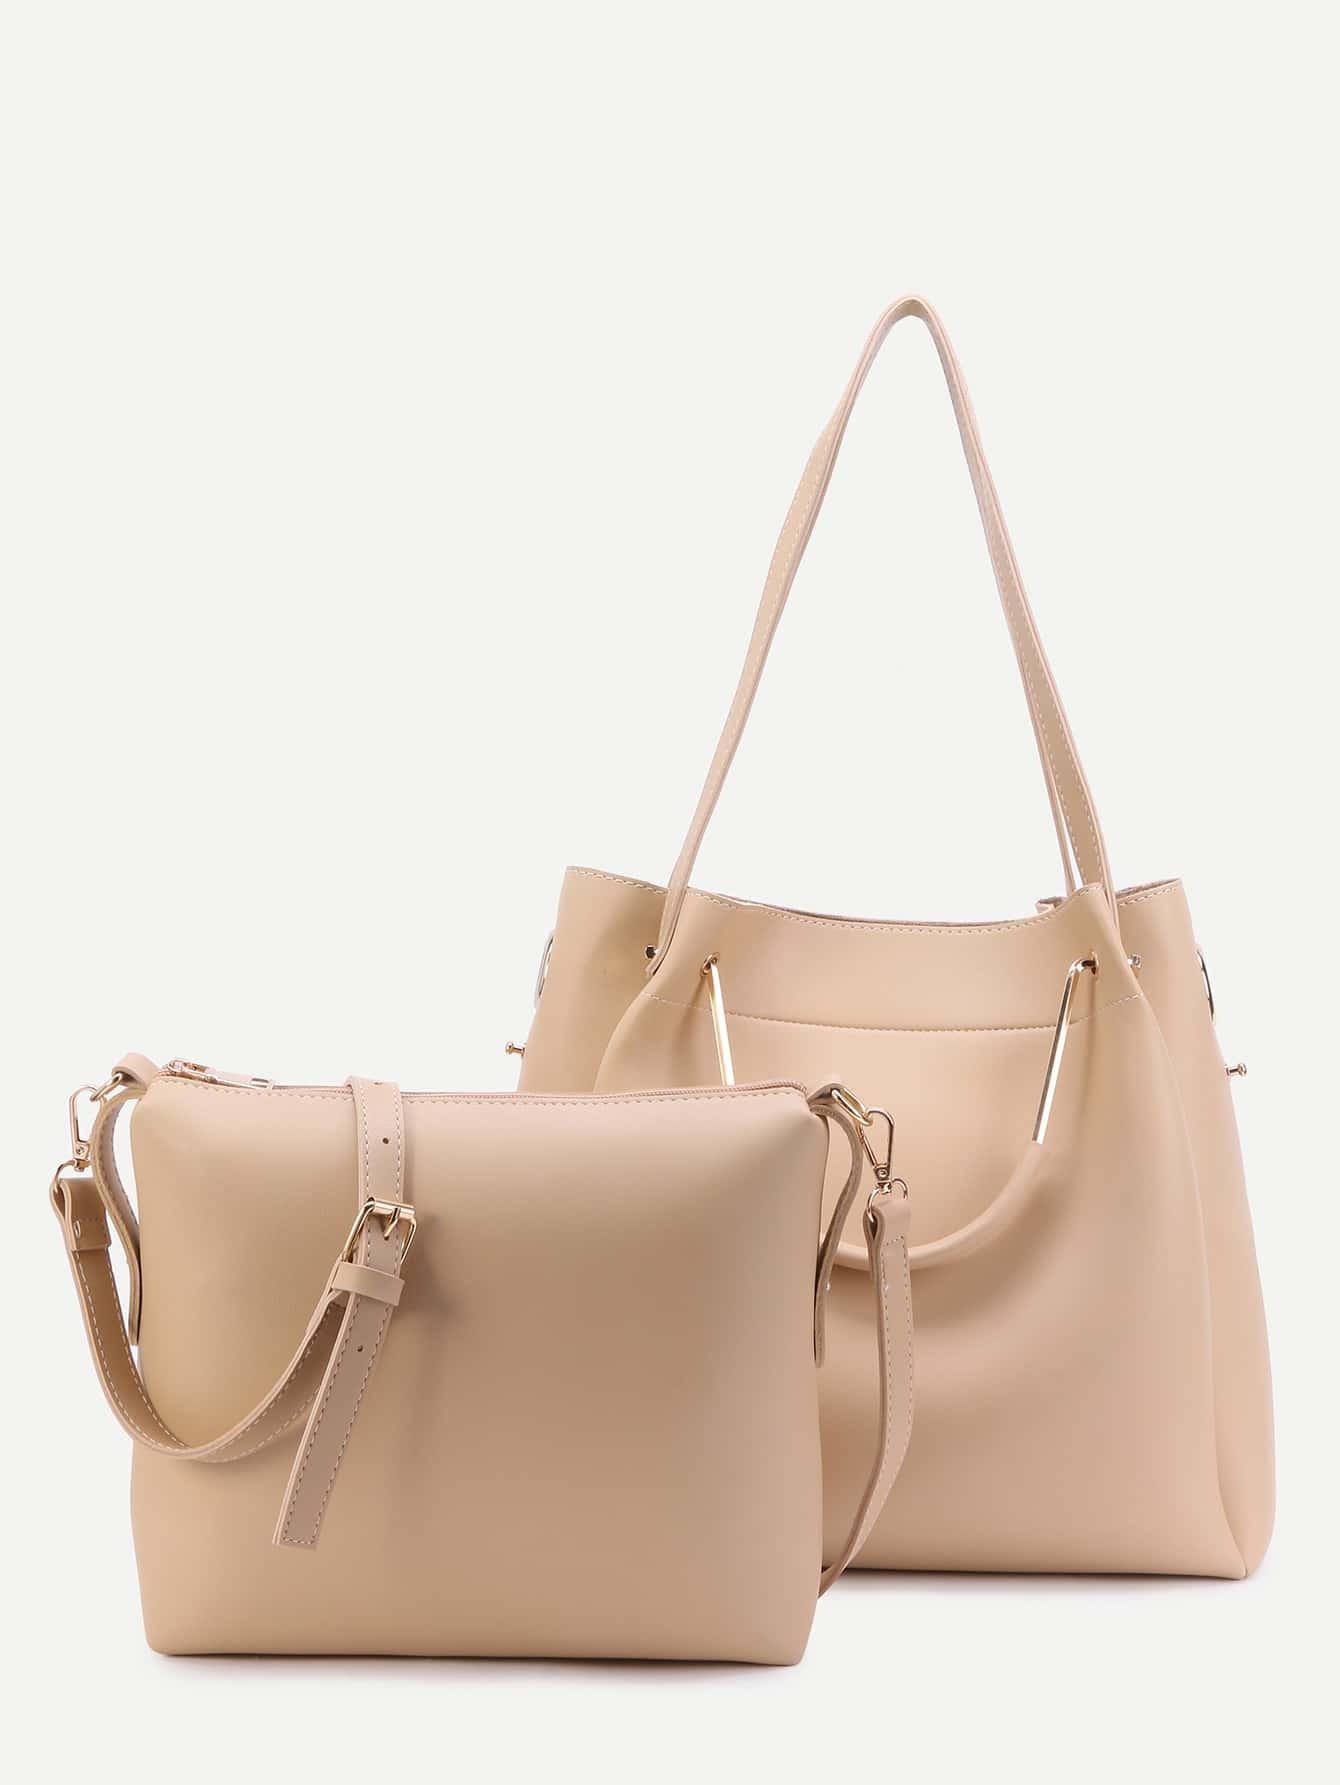 bag160929919_2